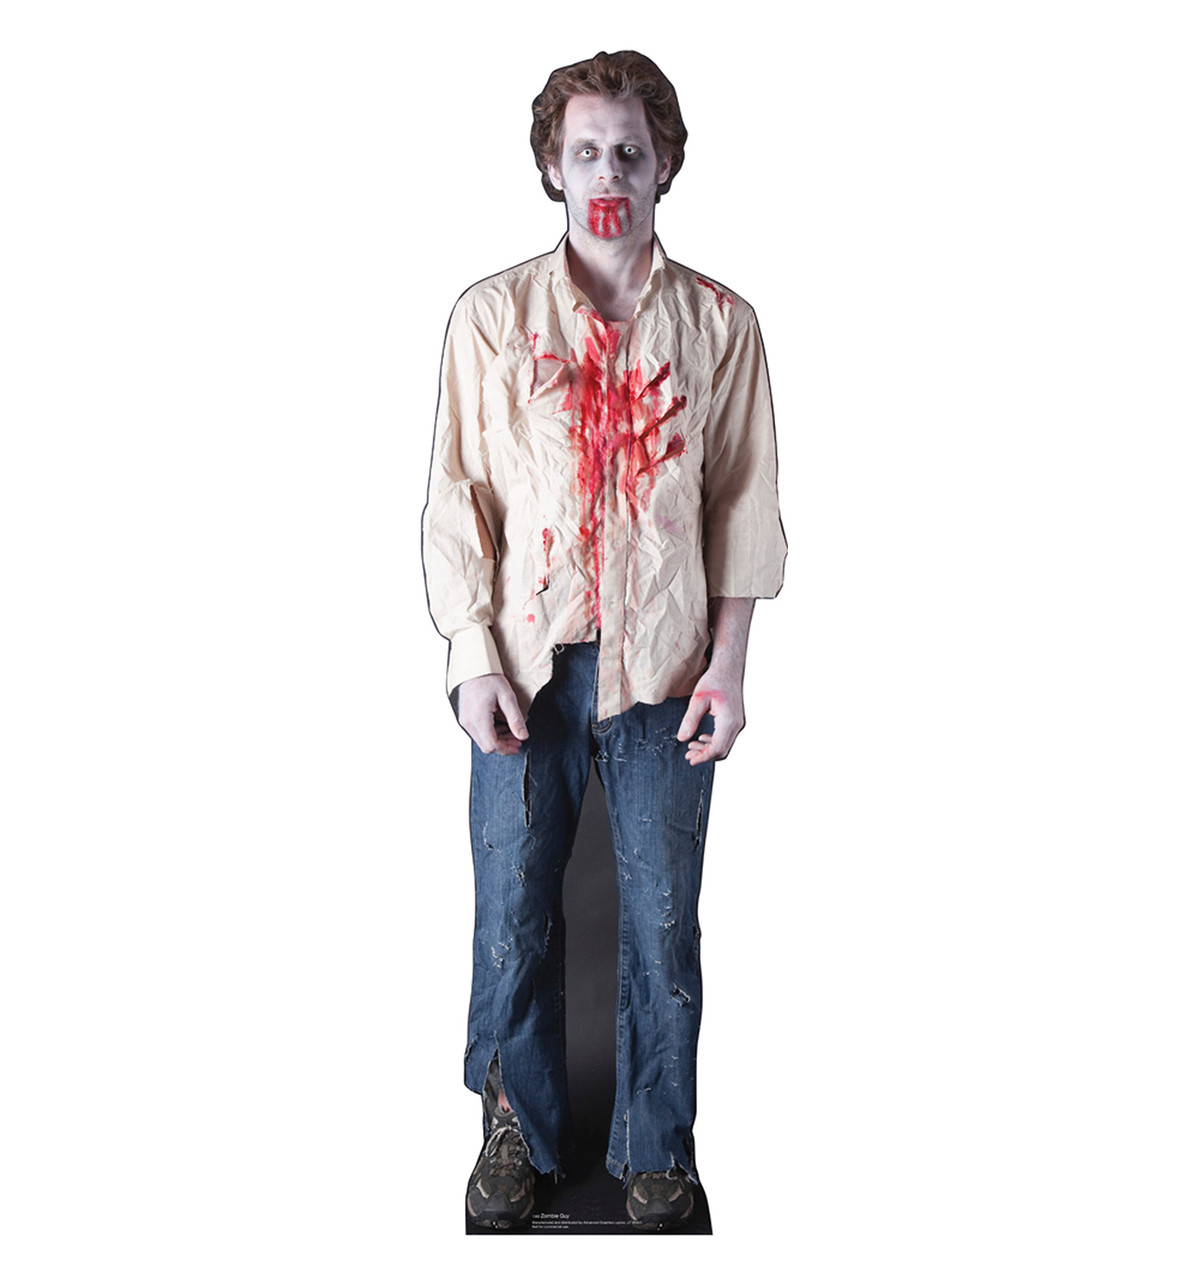 Zombie Guy - Cardboard Cutout